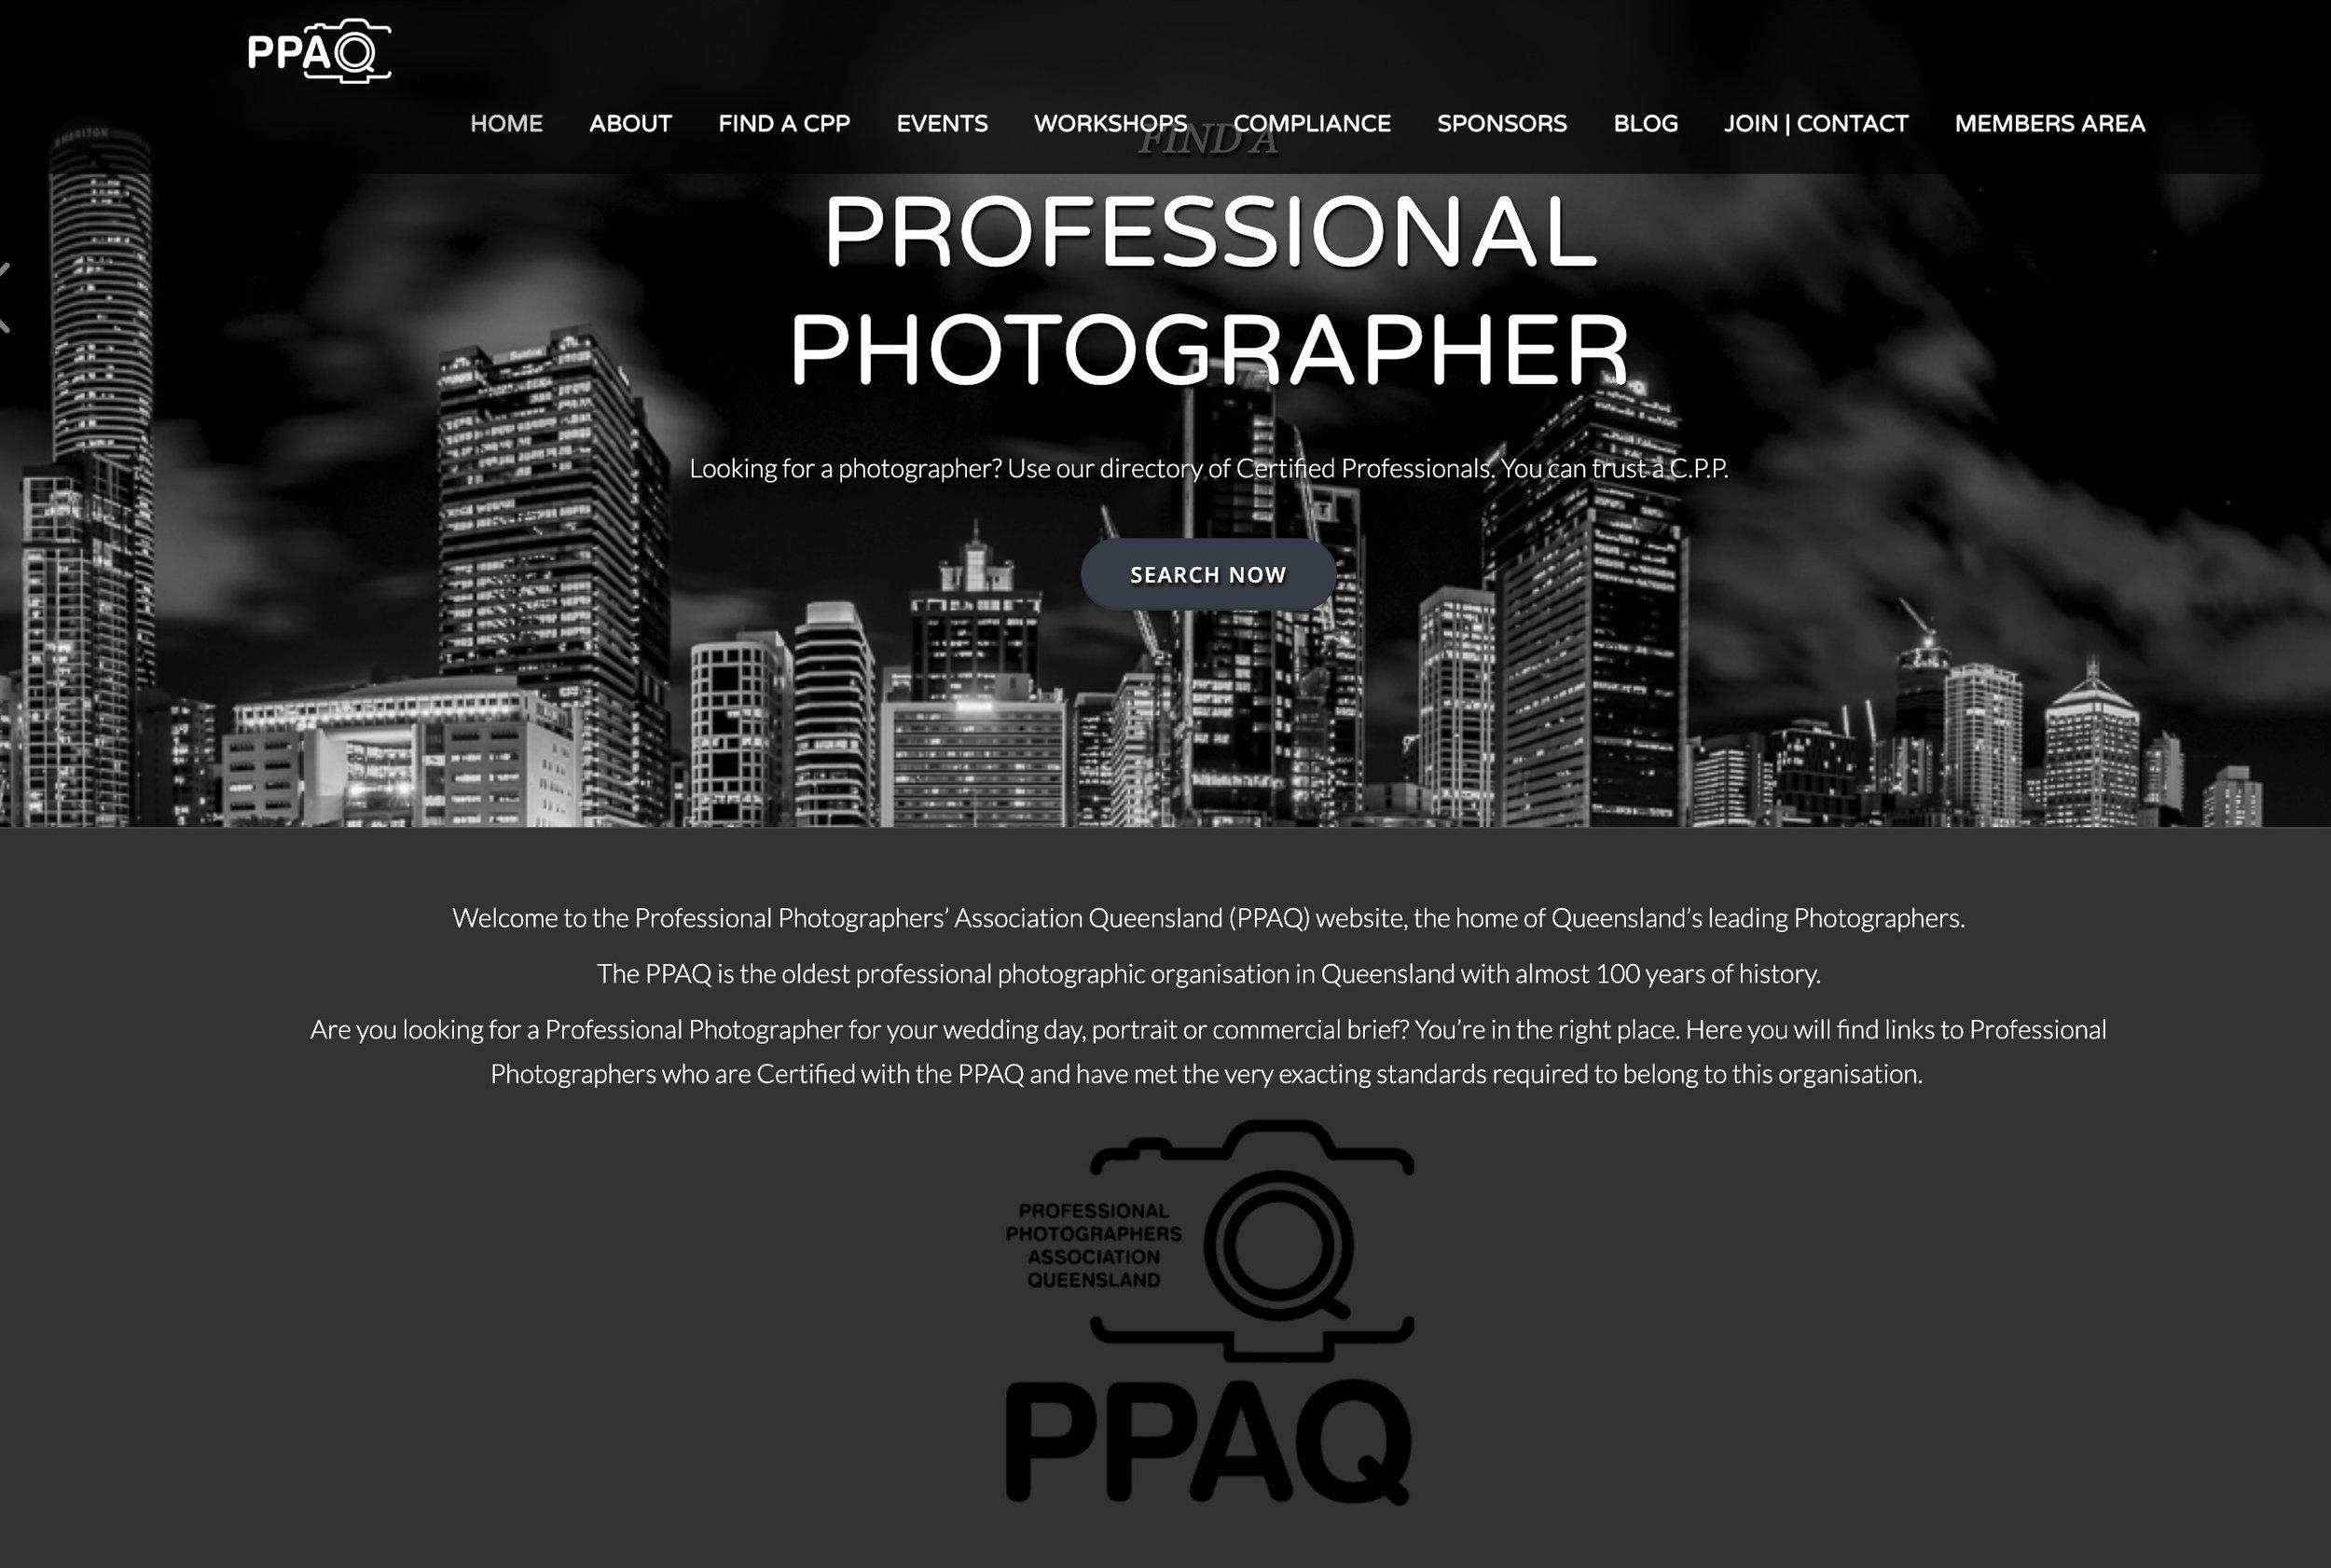 ppaqcrop.jpg